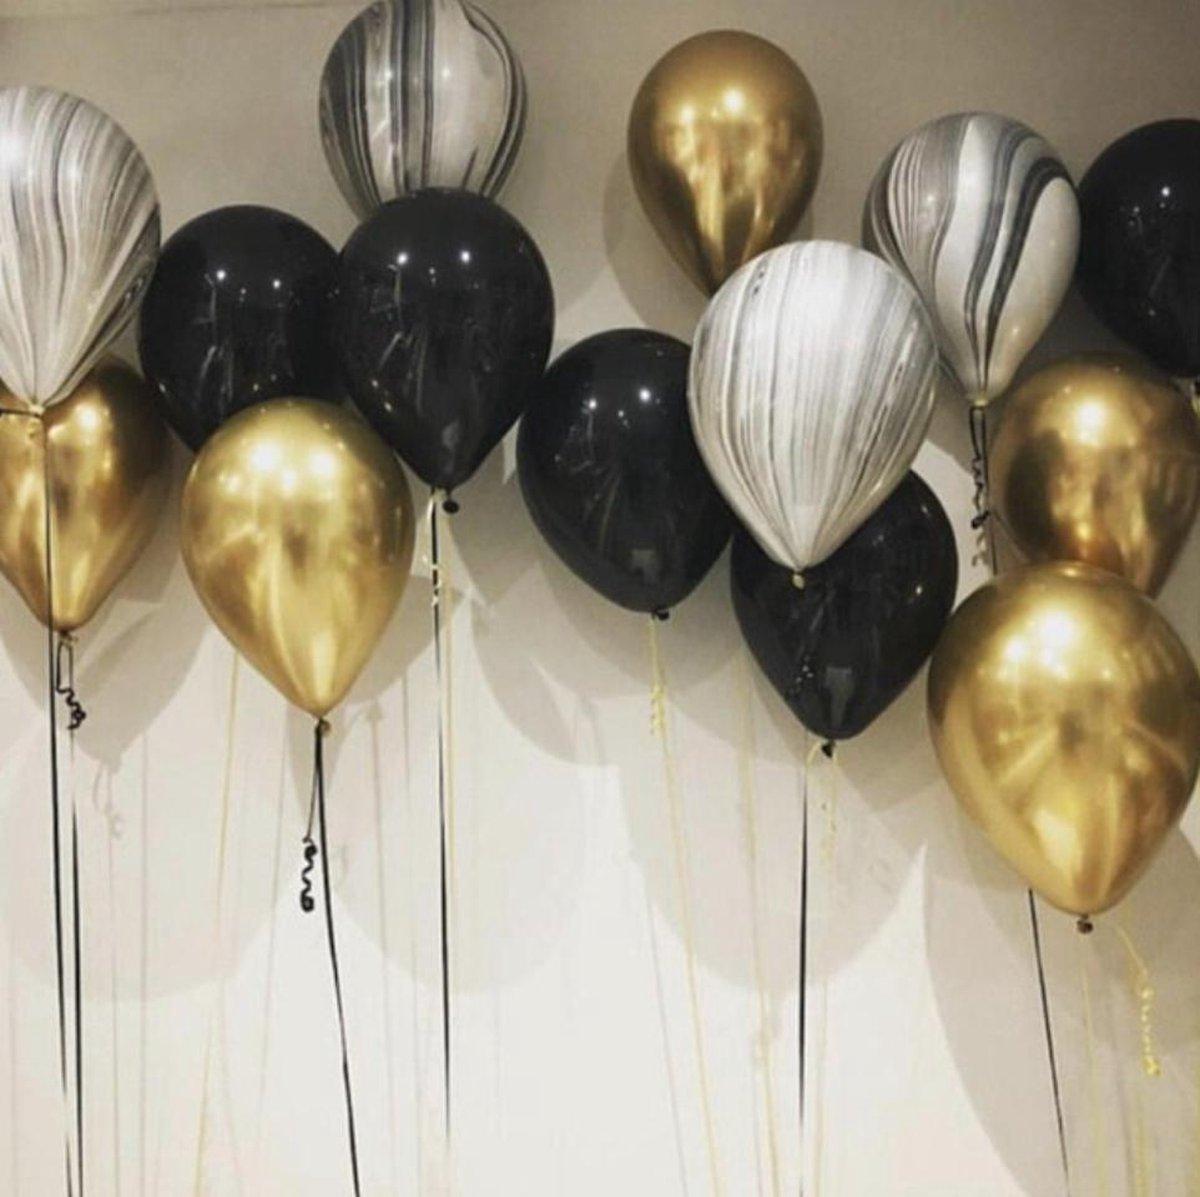 Luxe Ballonnenset 15 Stuks Goud Zwart - Helium Ballonnen. Ballonnen Feestje Verjaardag Party